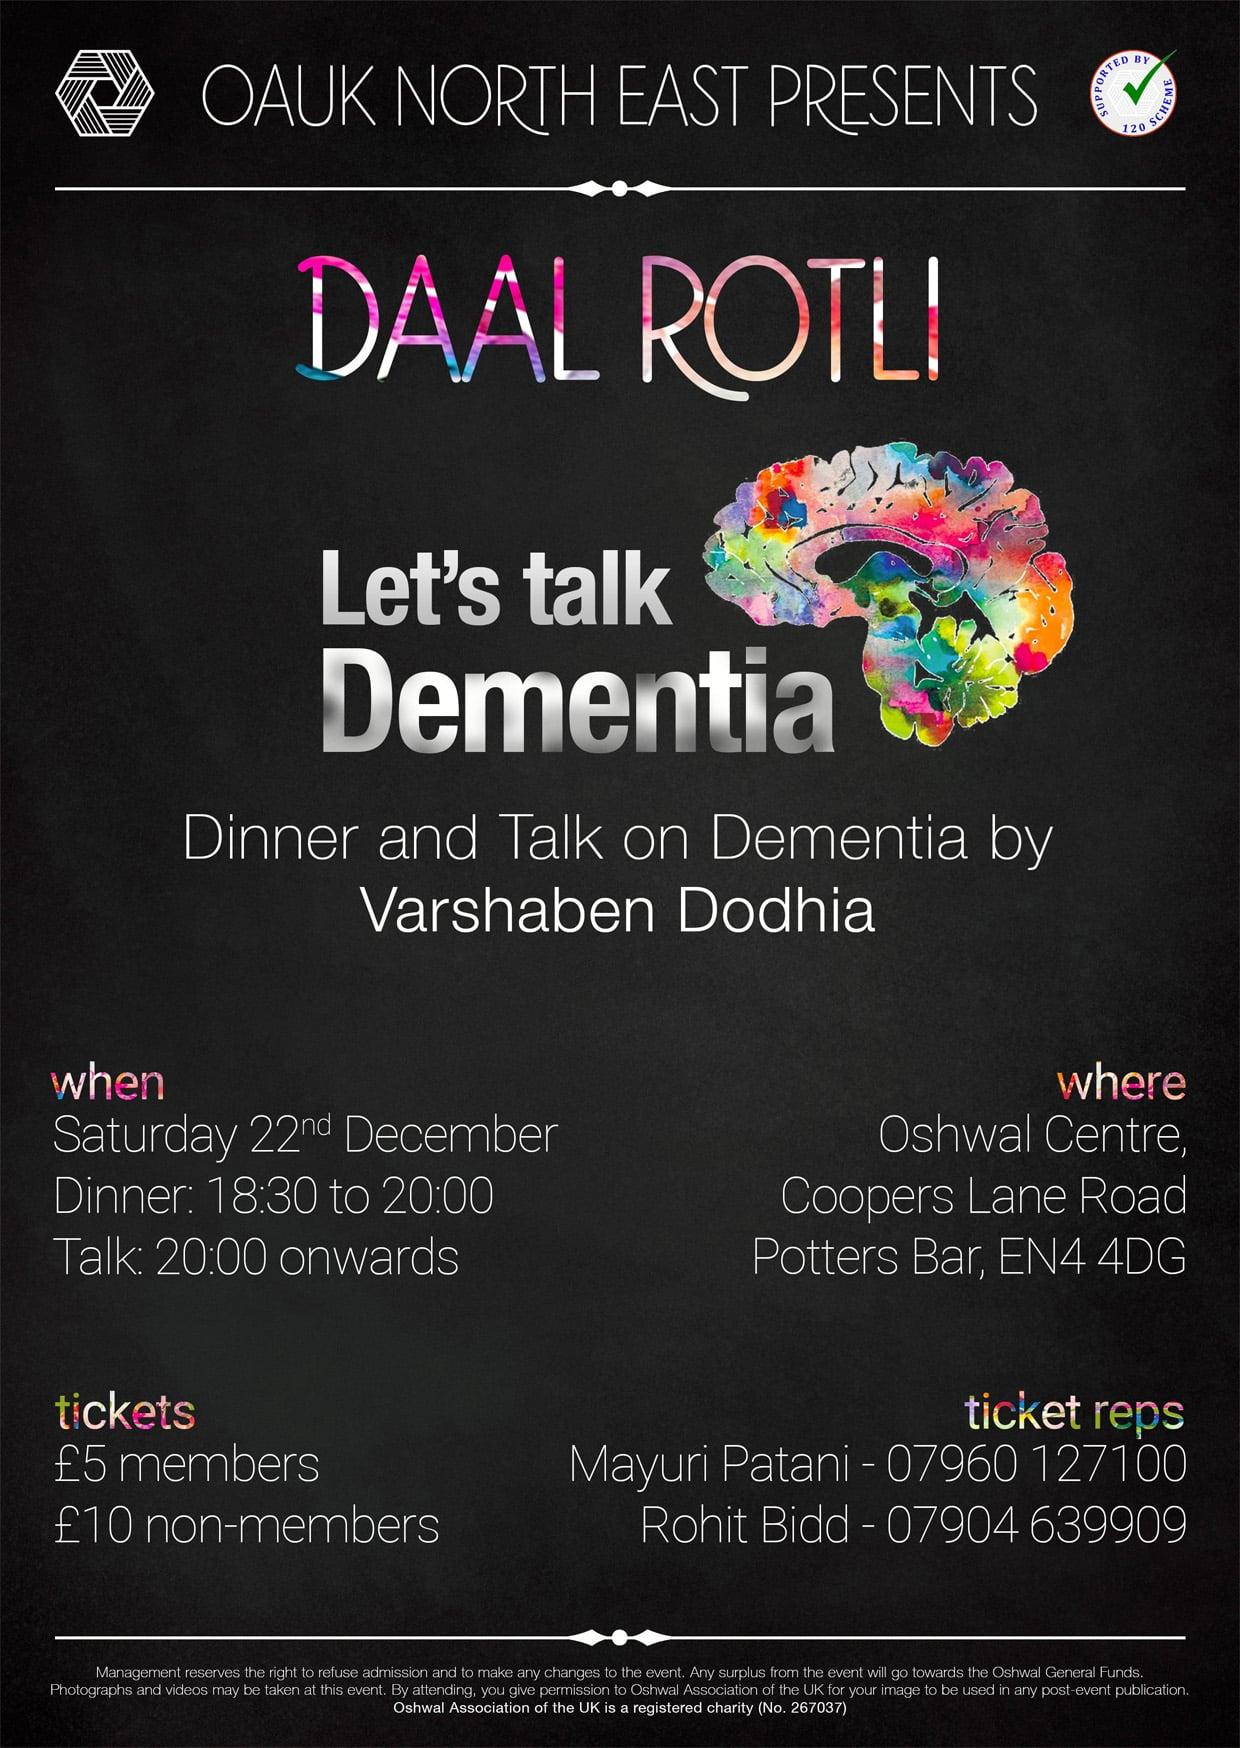 NE Daal Rotli poster